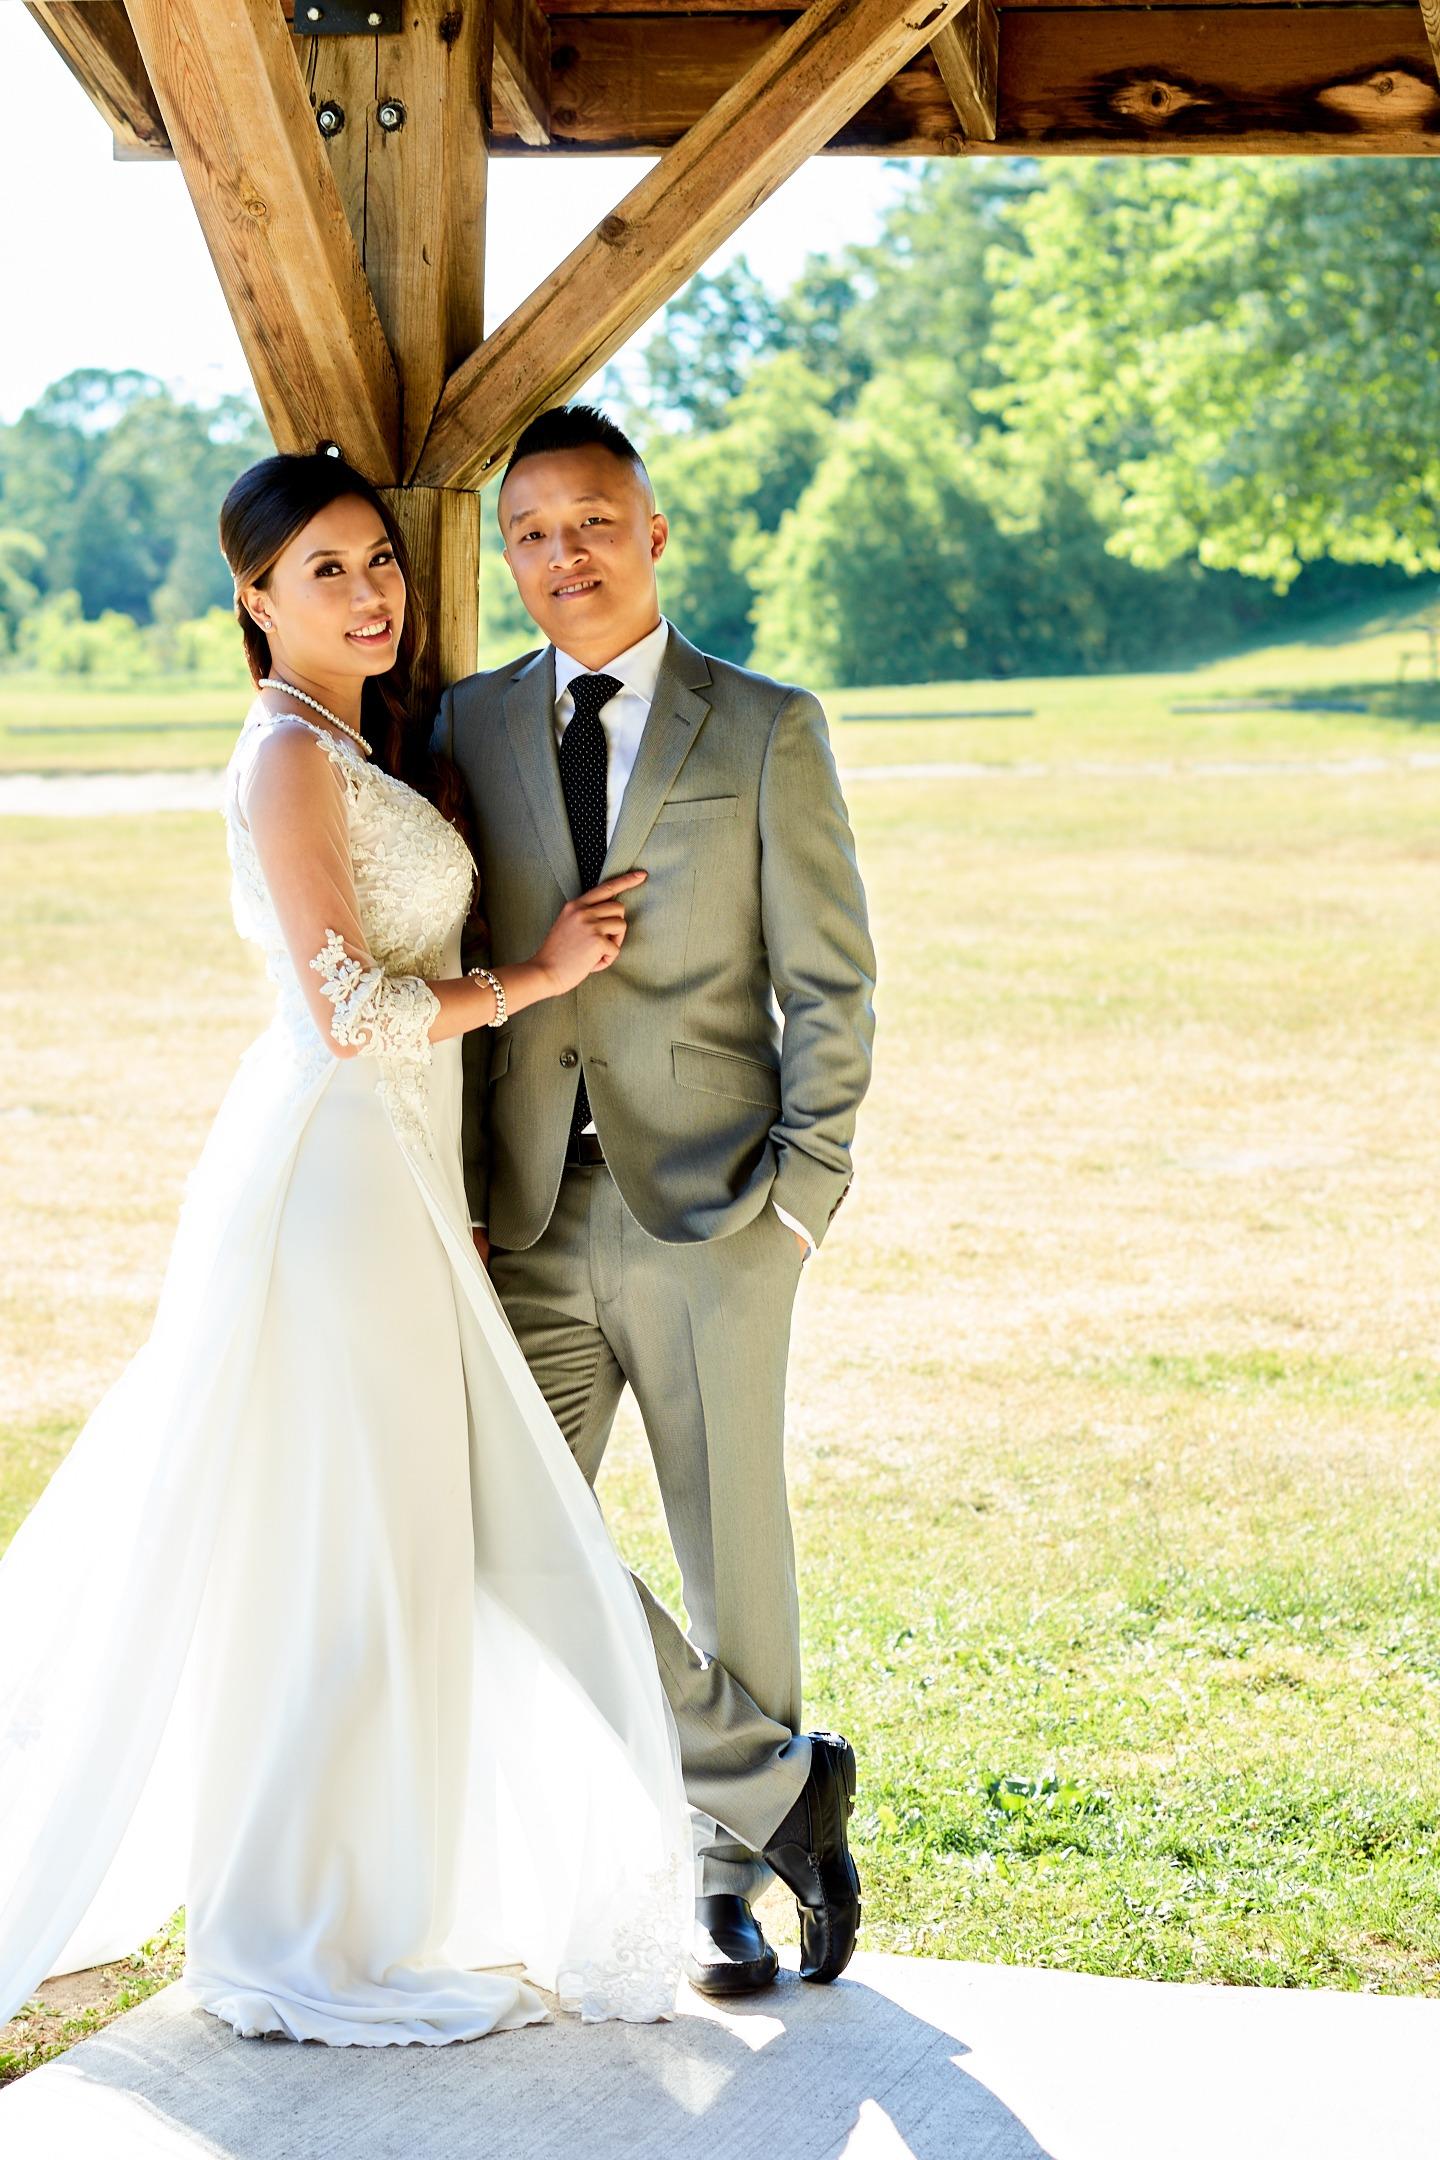 Wedding Engagement Portrait Photography Photoshoot GTA